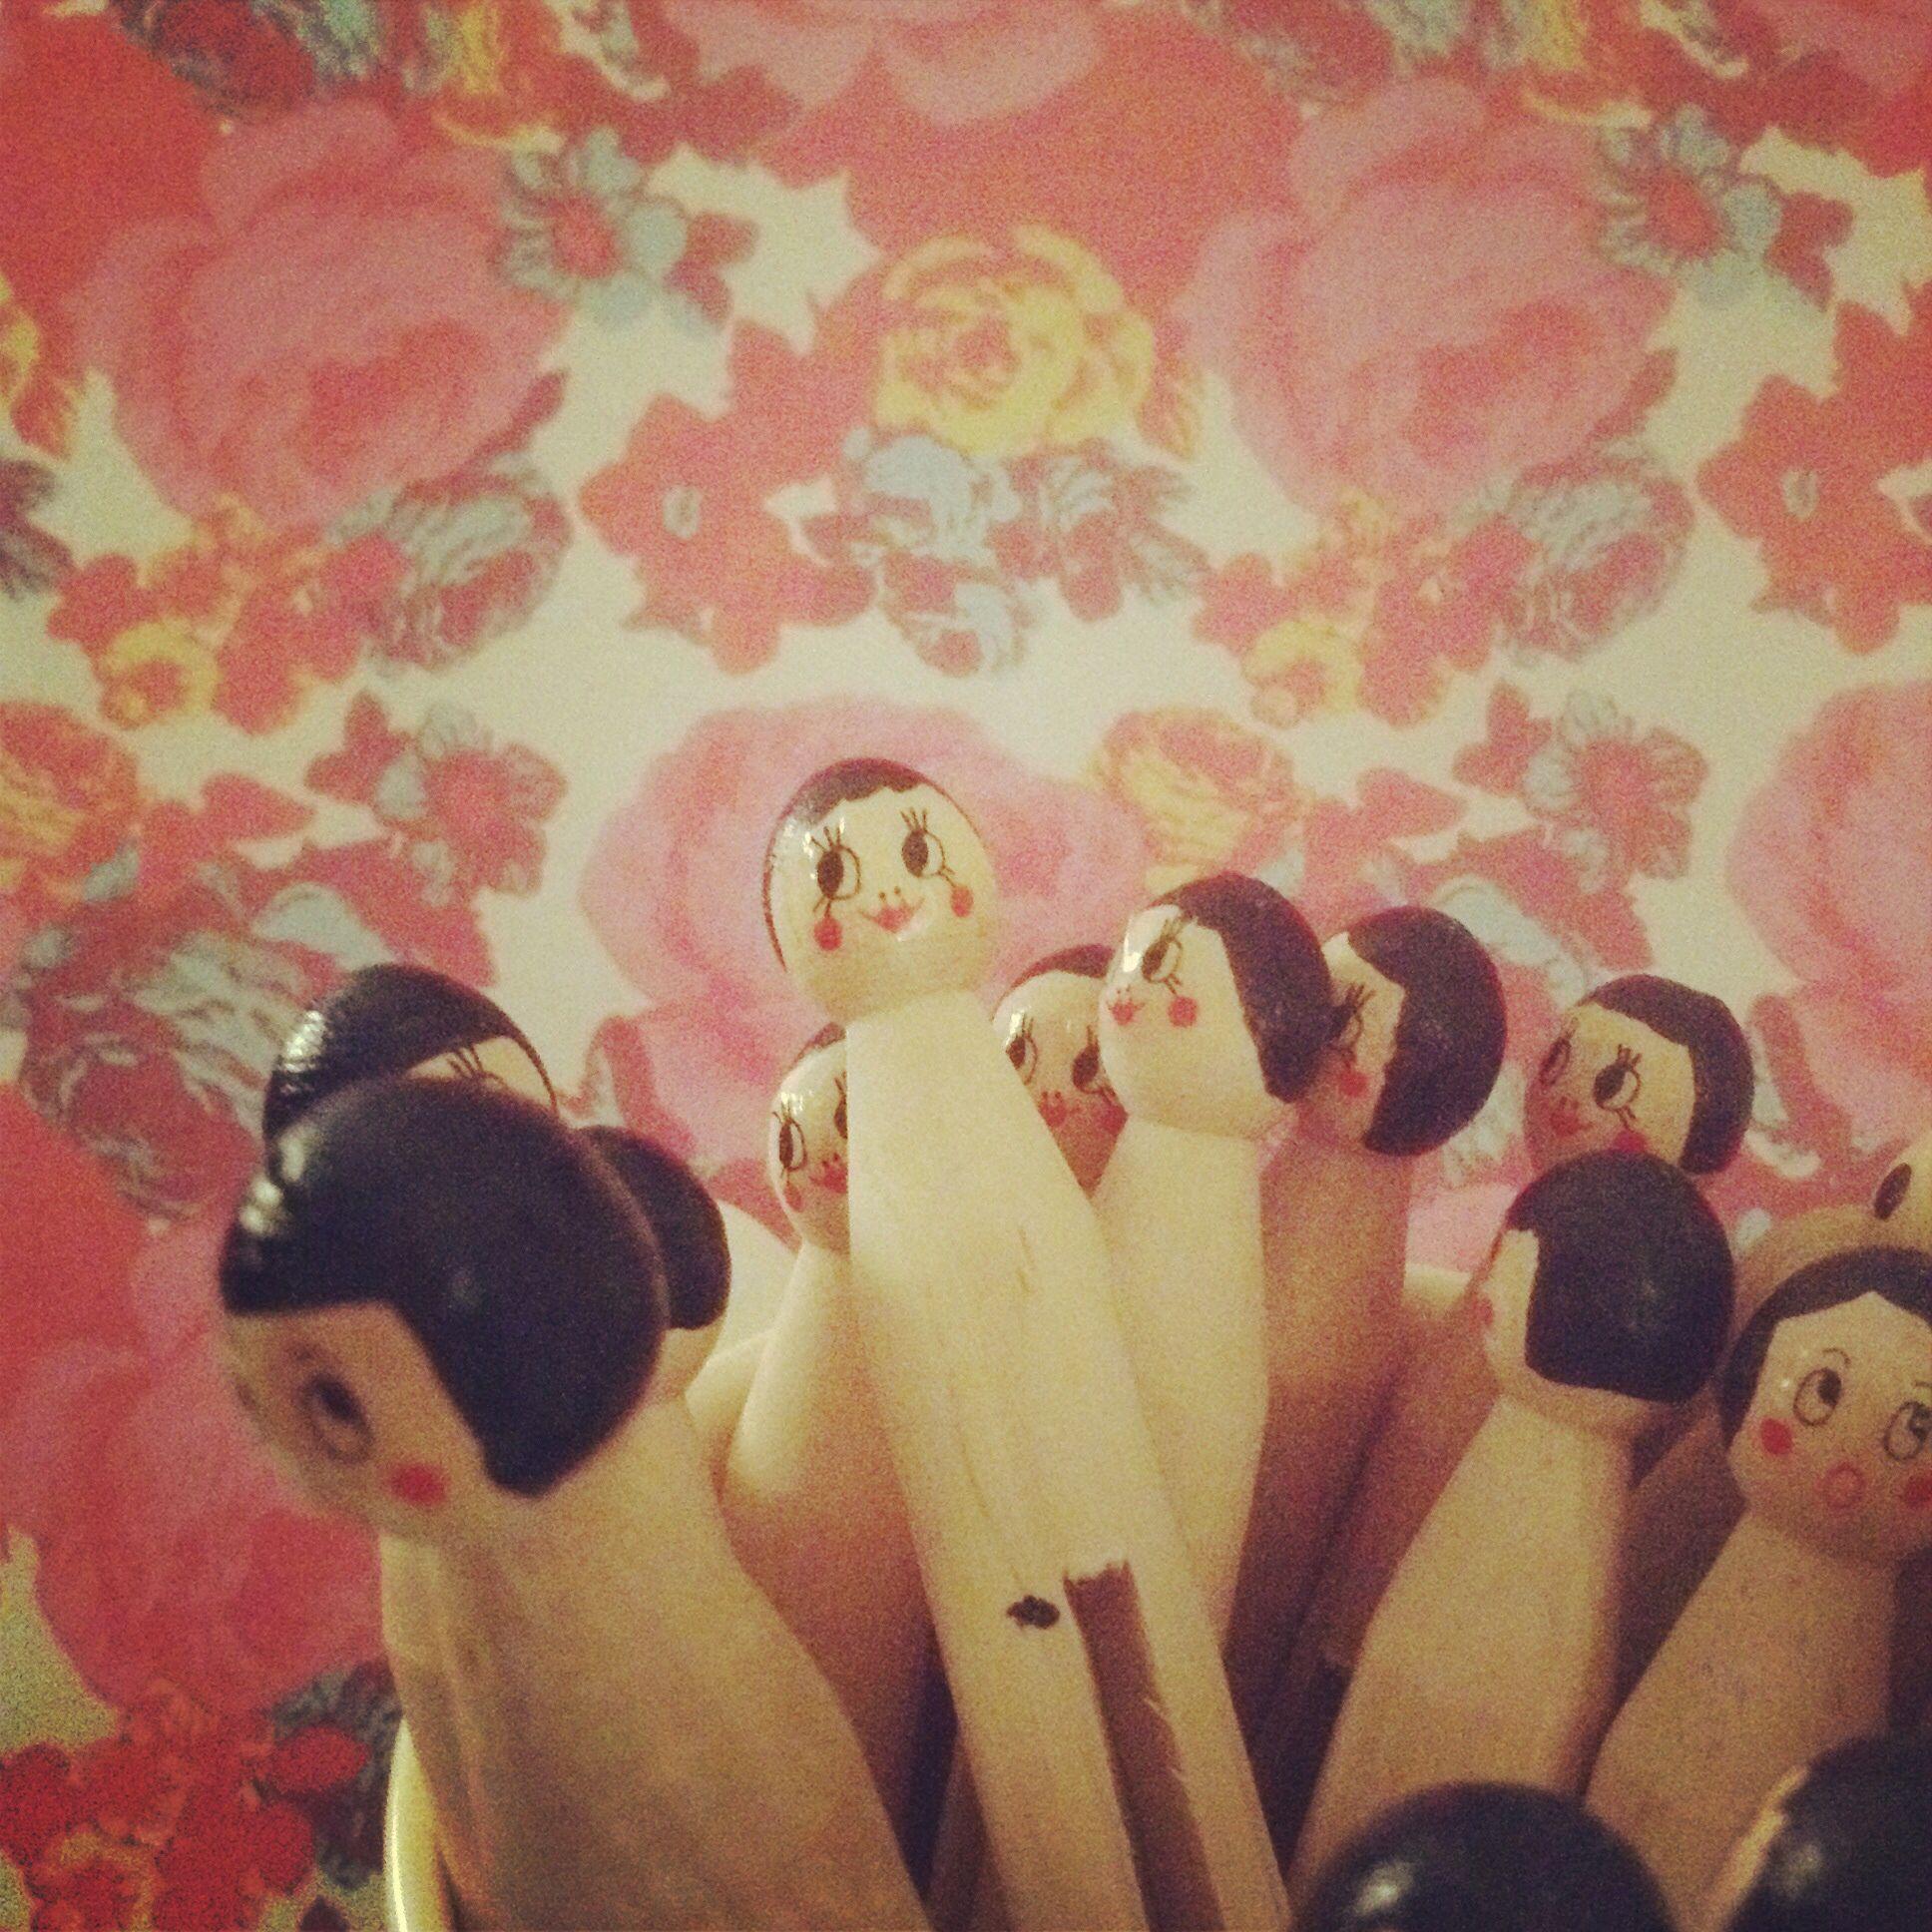 Peg doll creations